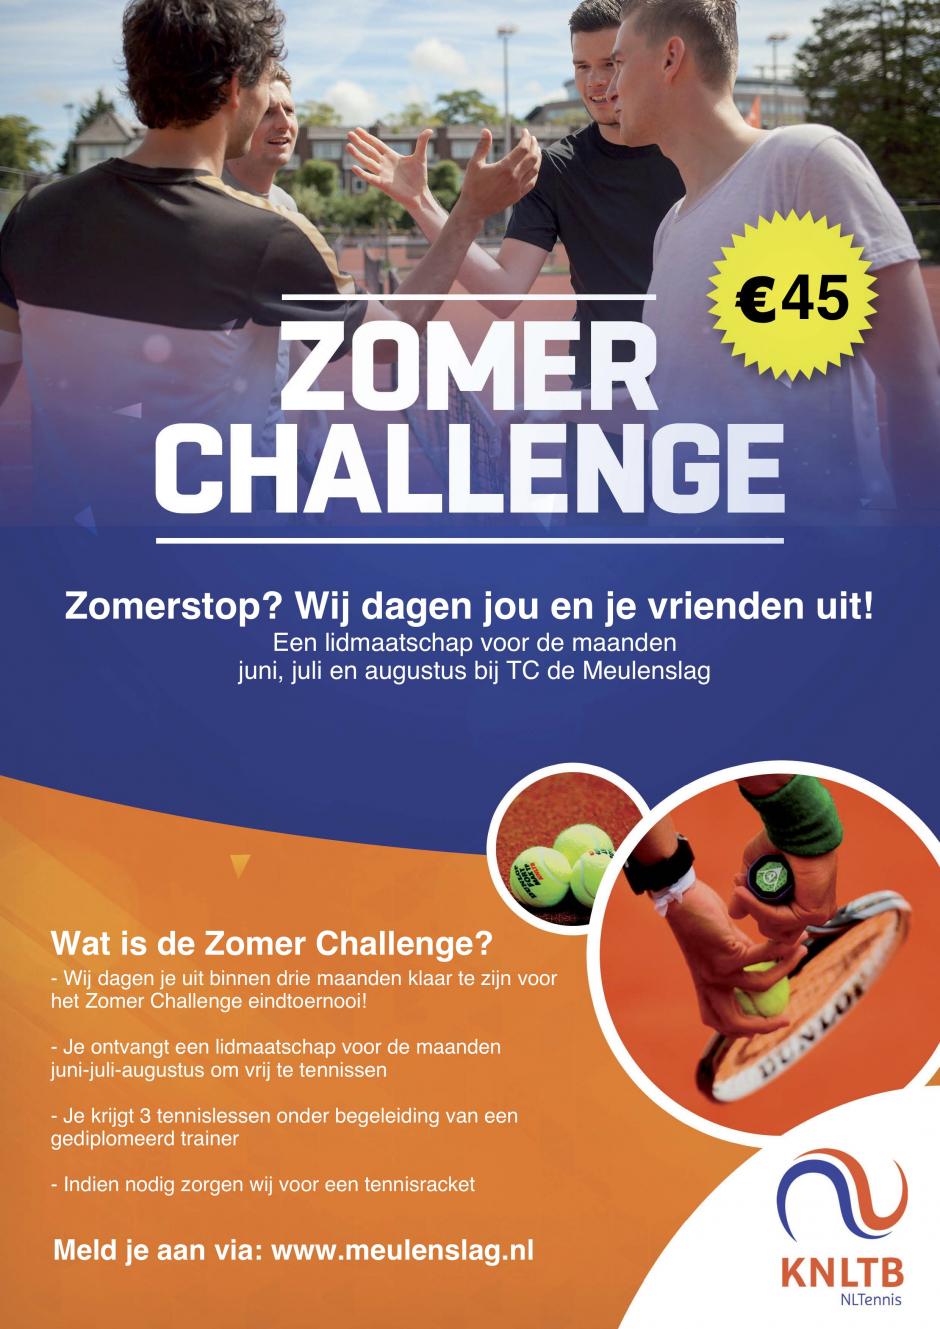 poster_zomer_challenge_2.jpg